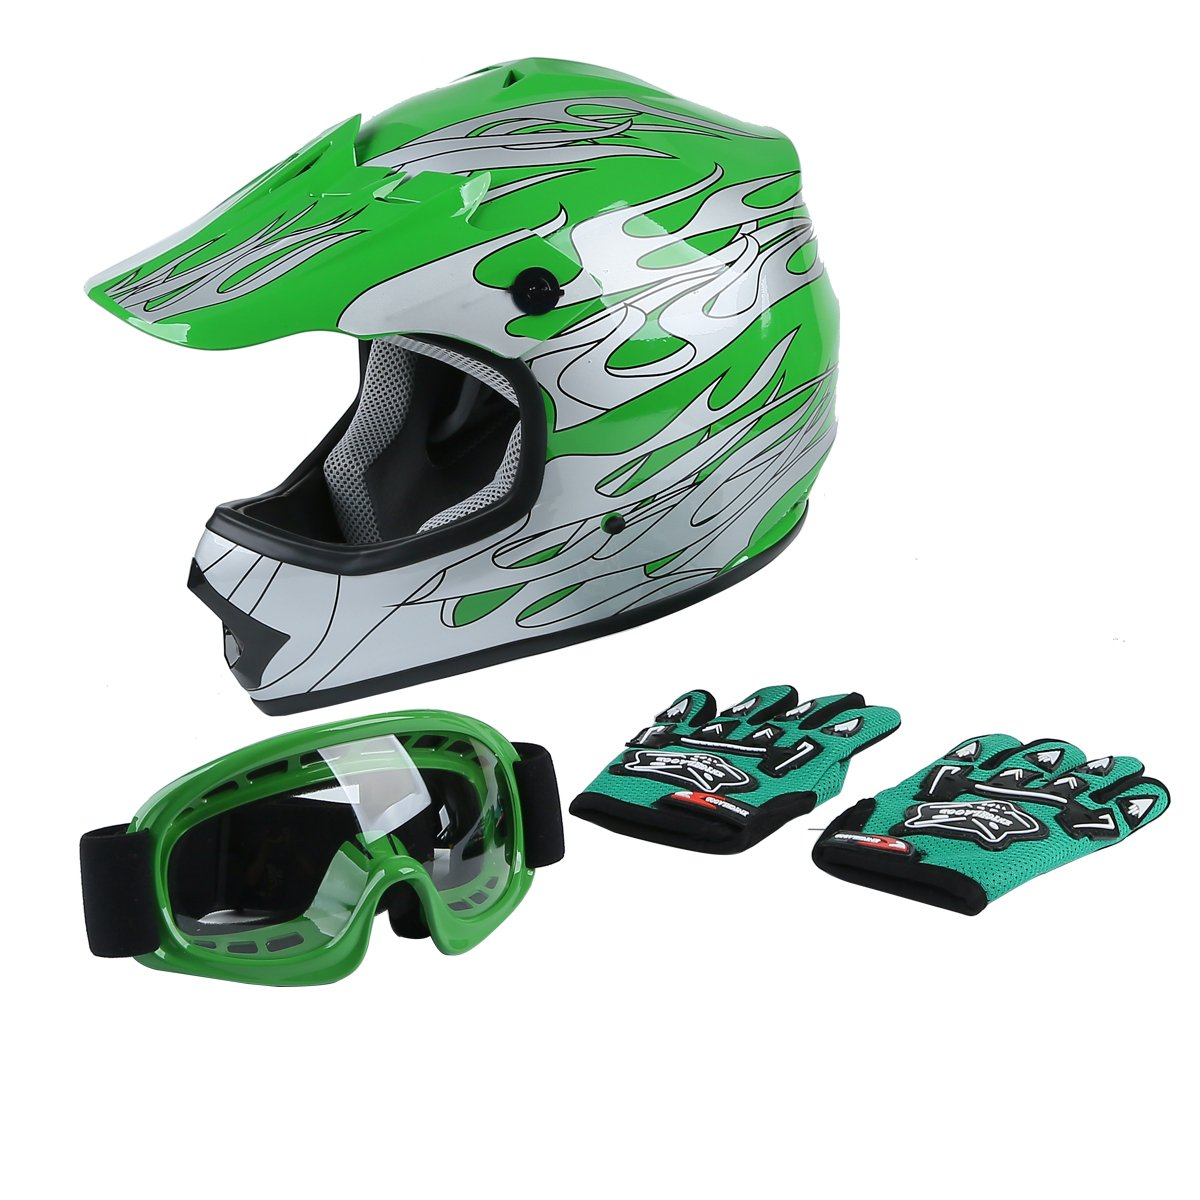 Tengchang Youth Kids Motocross Offroad Street Dirt Bike Helmet Goggles Gloves Atv Mx Helmet Green Flame